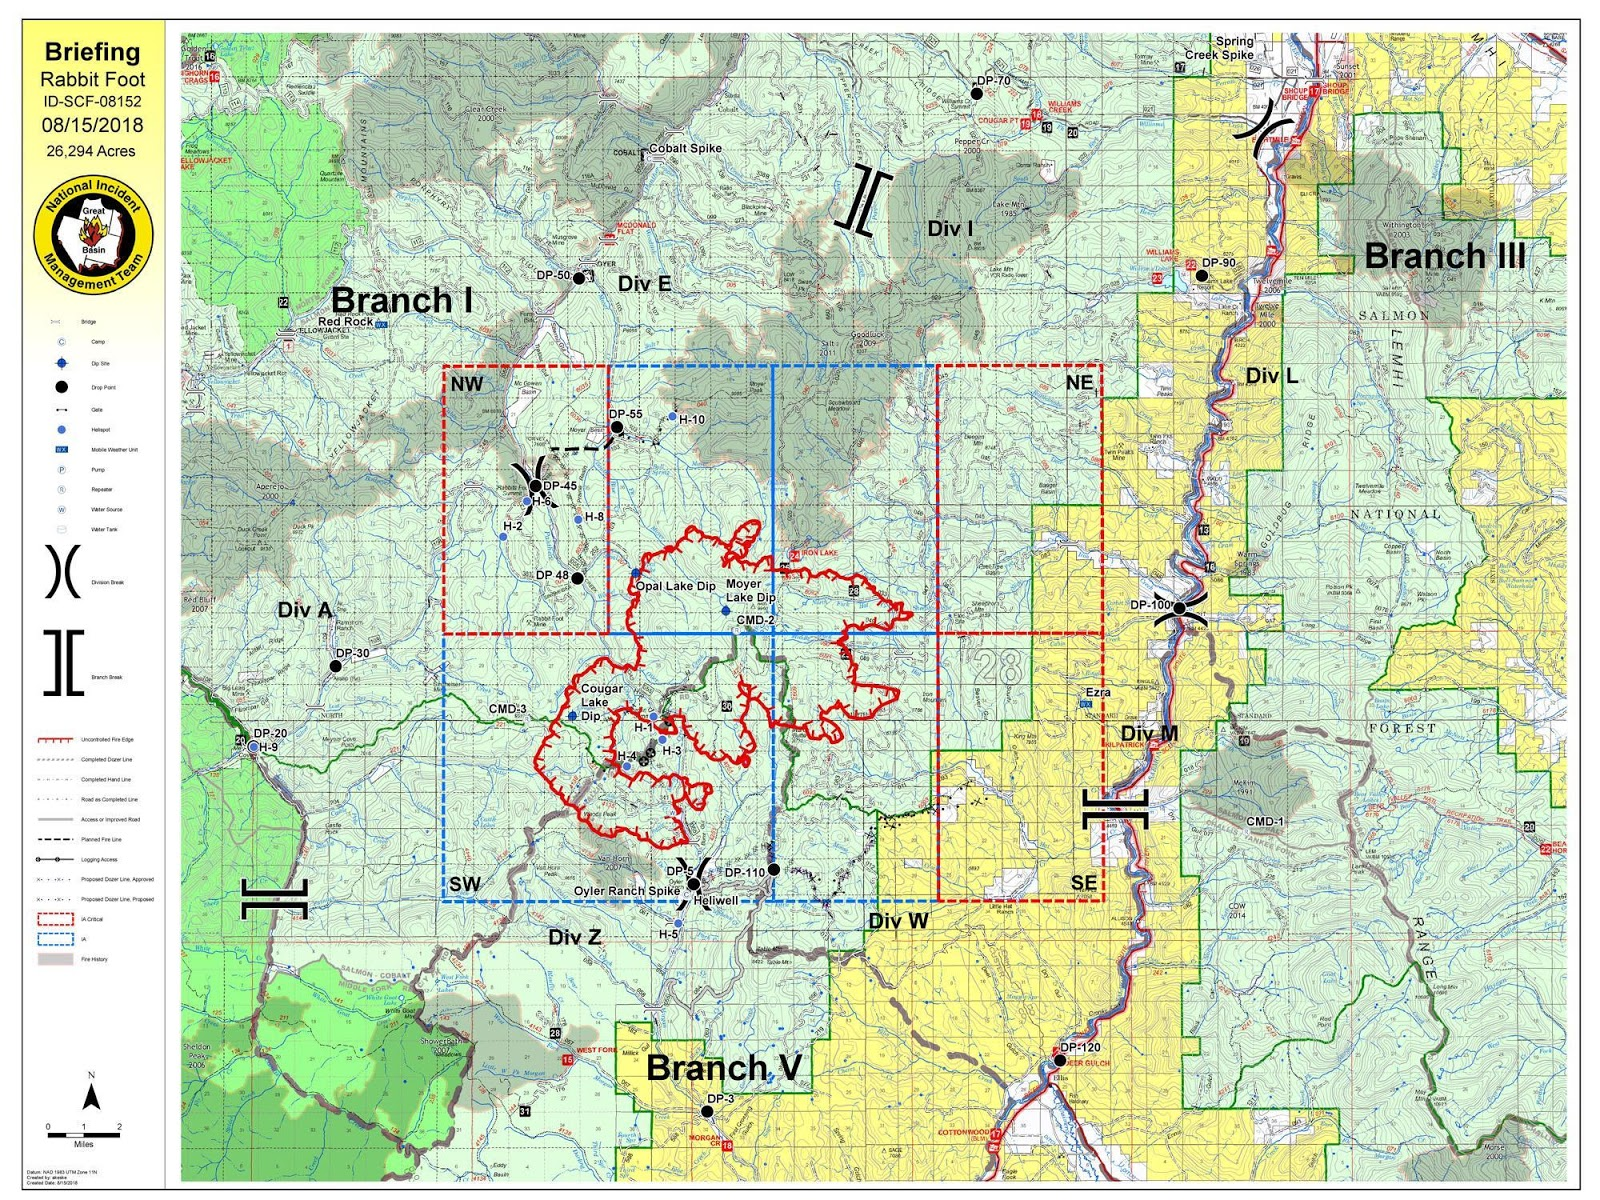 Idaho Fire Information Rabbit Foot Fire Update August 15th Pm